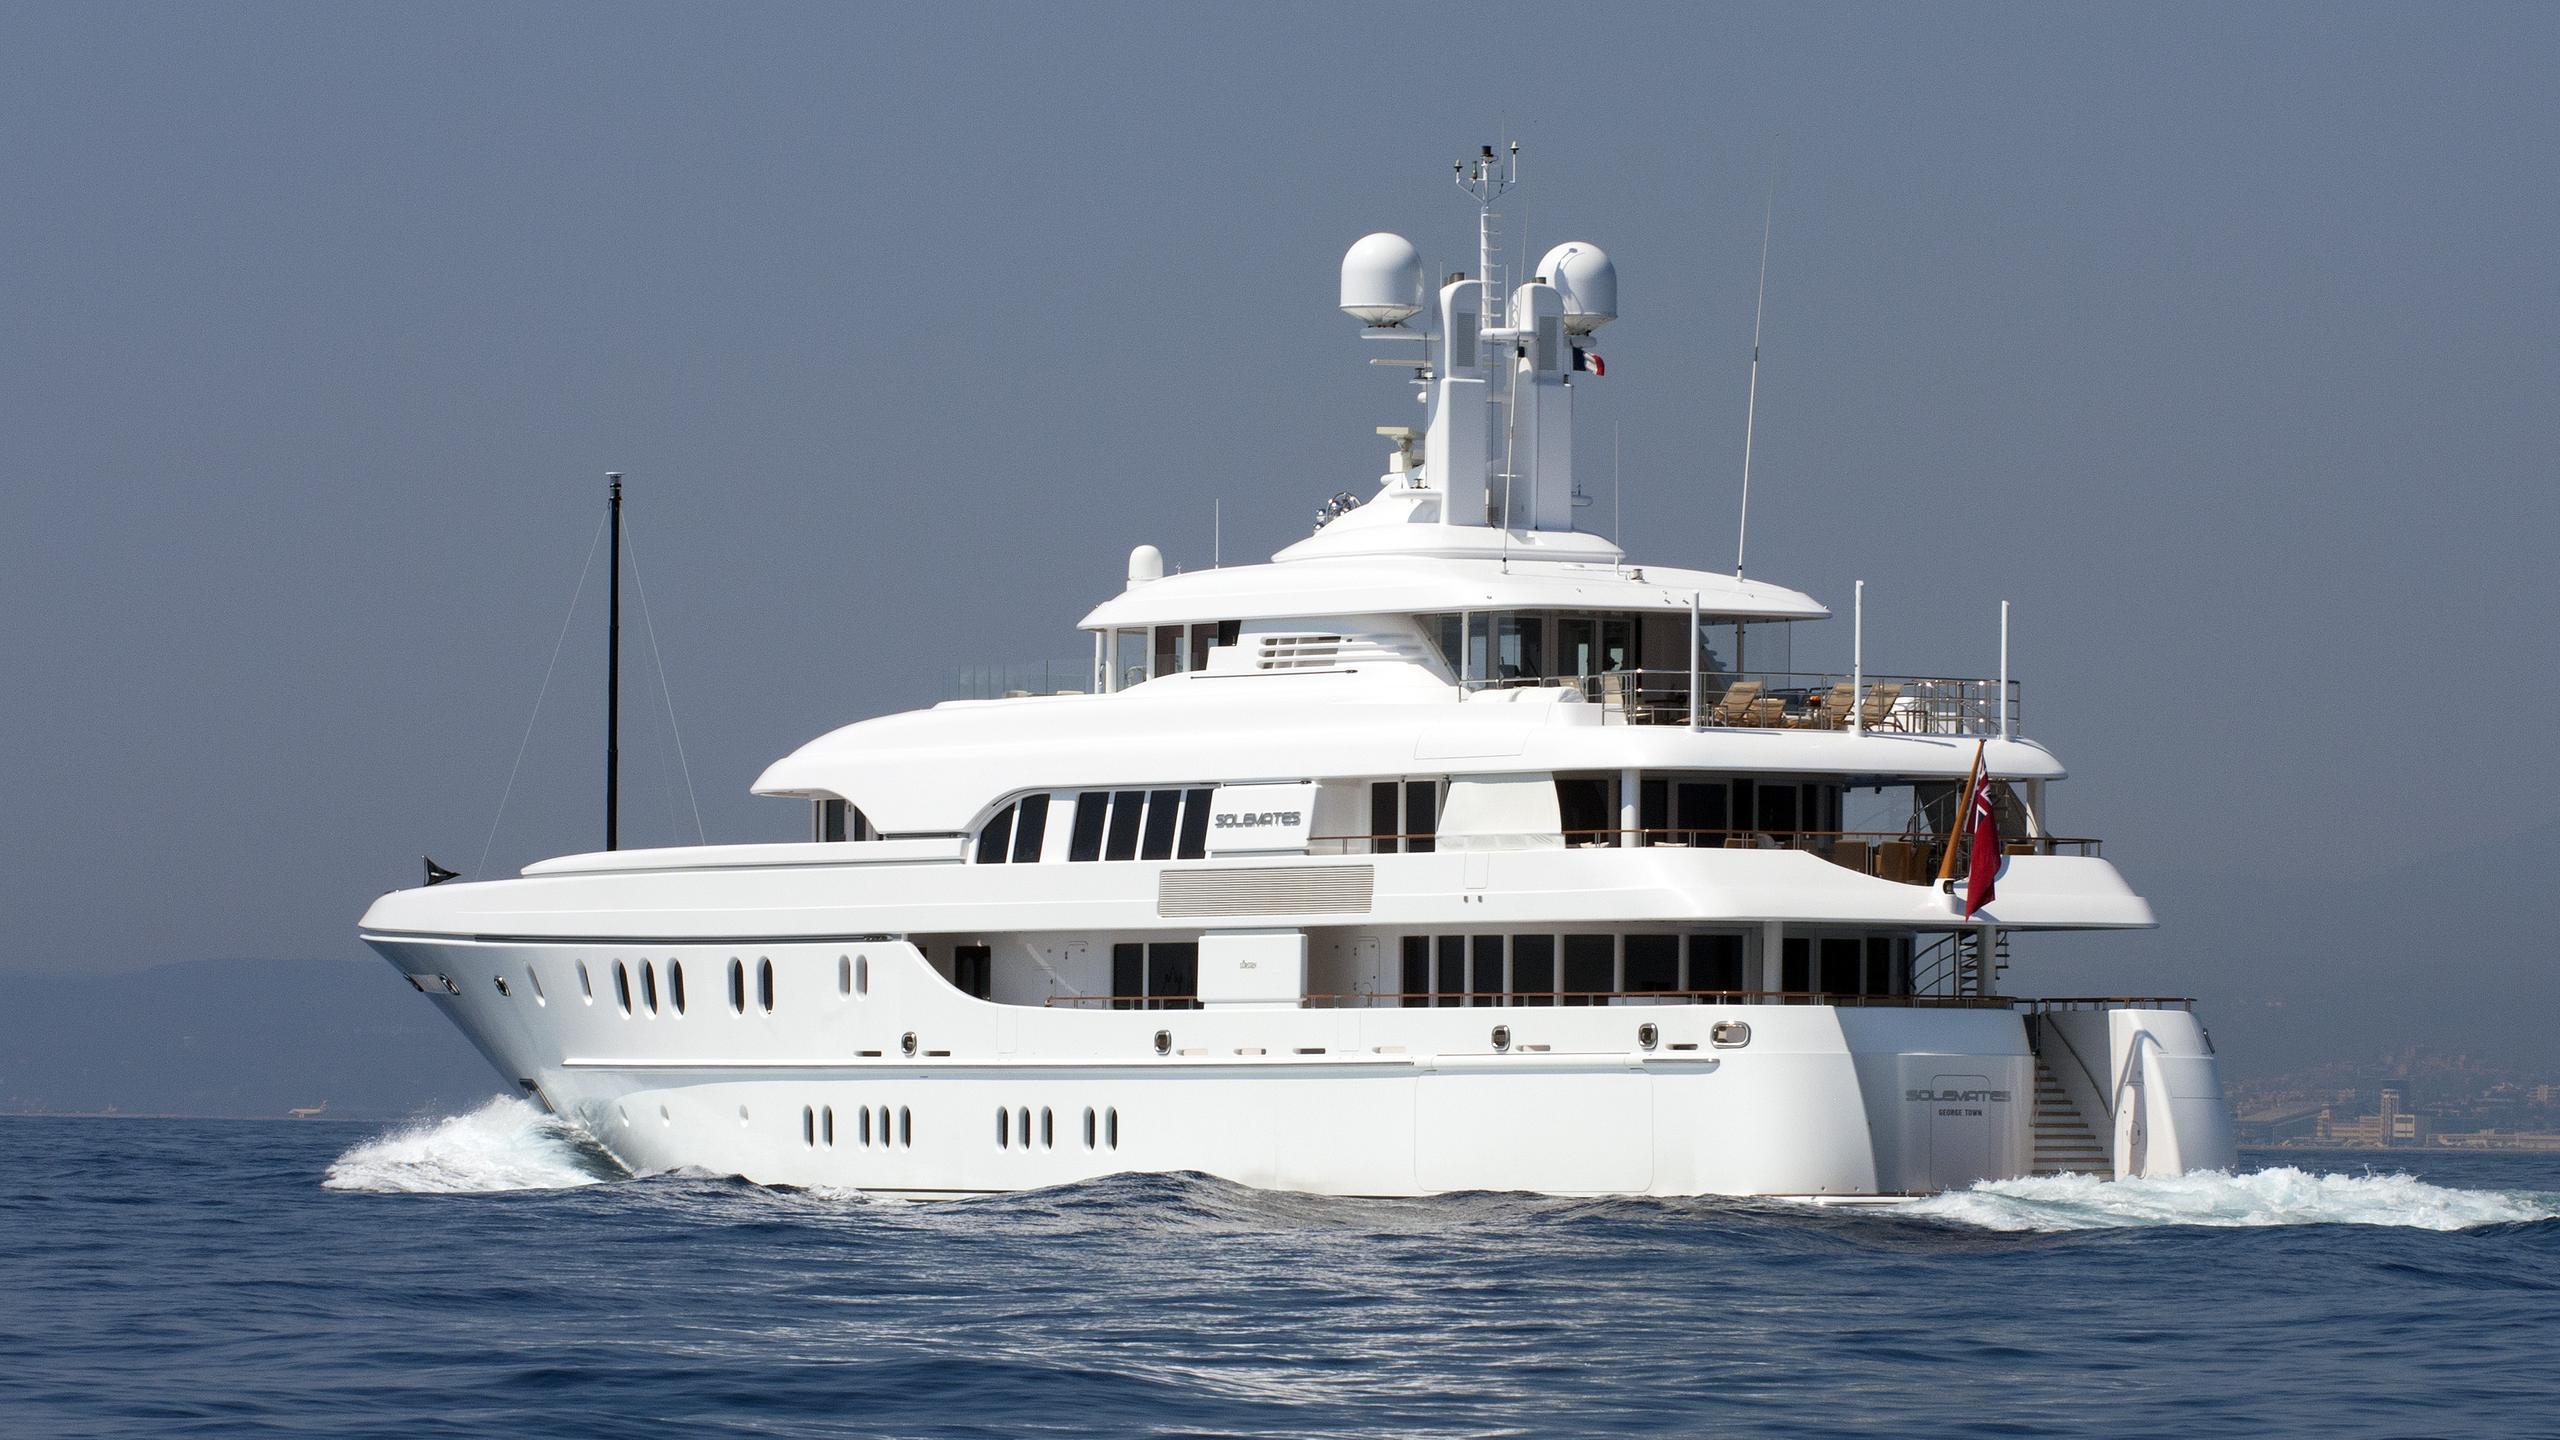 huntress-motor-yacht-lurssen-2010-60m-half-profile